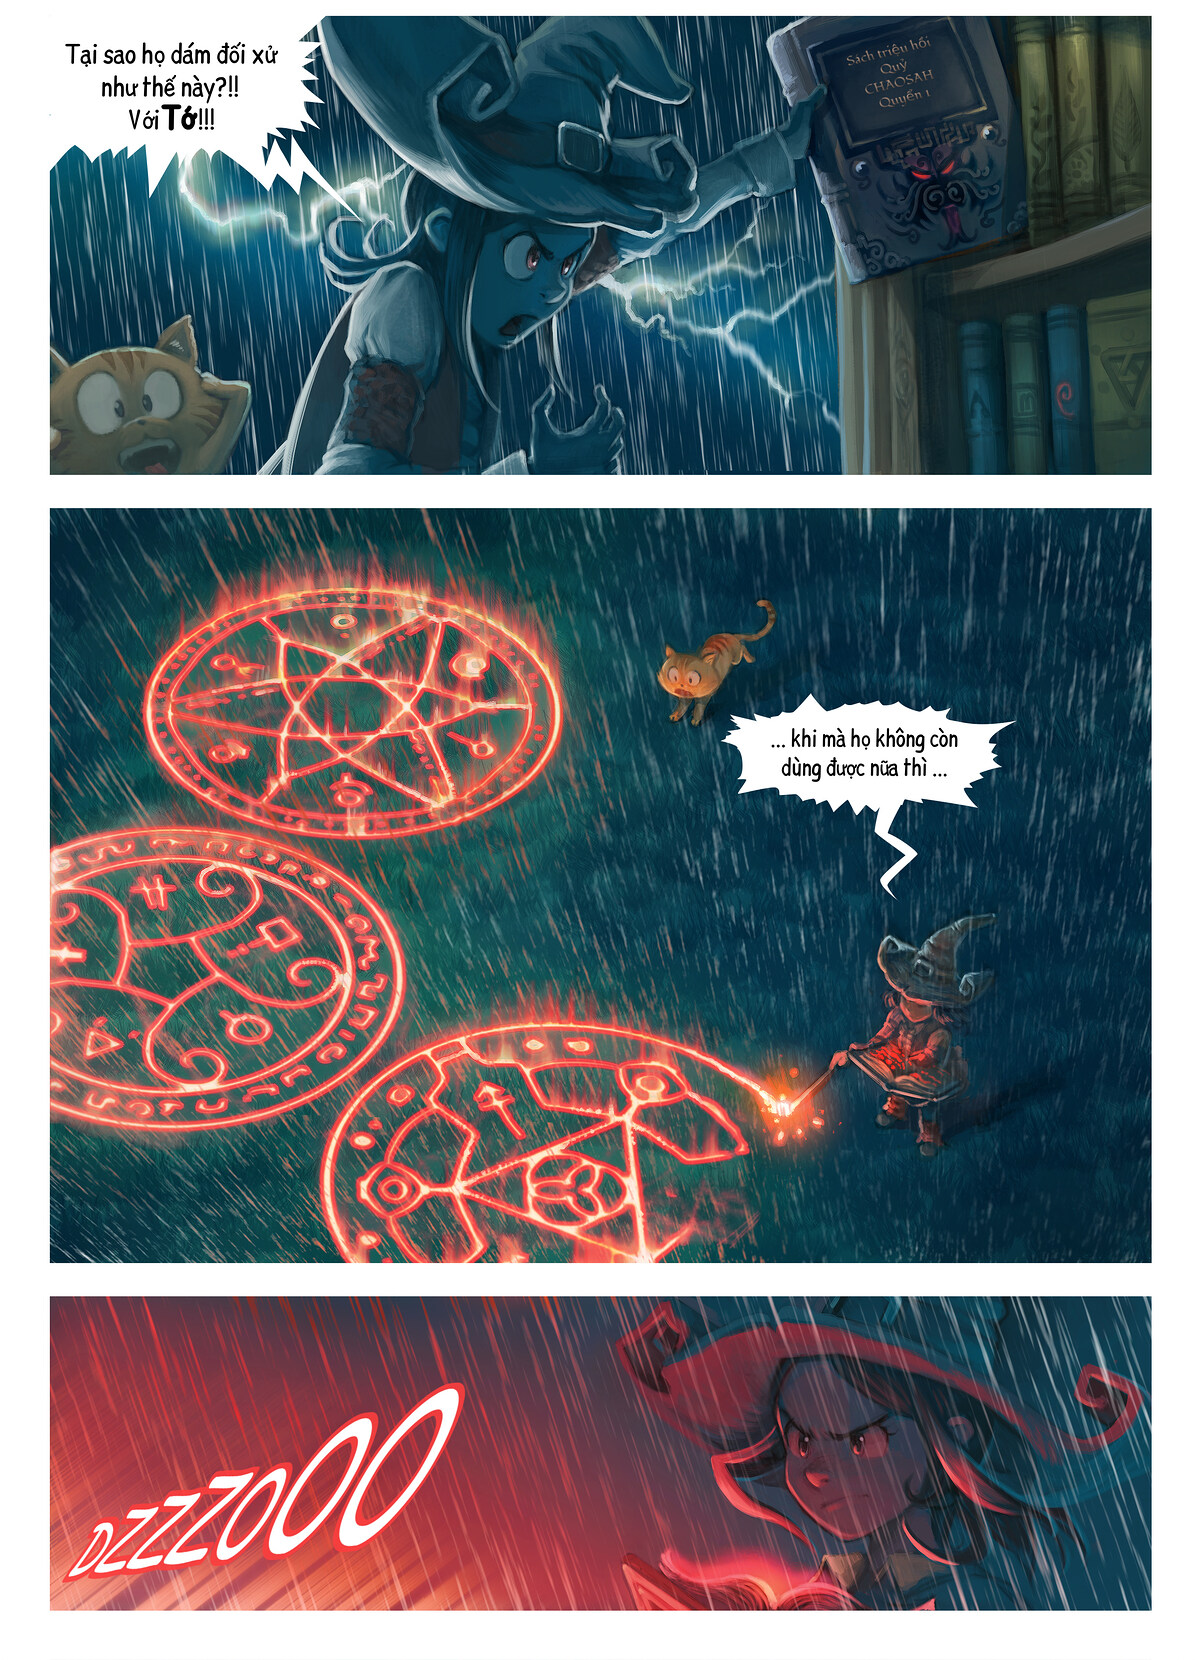 A webcomic page of Pepper&Carrot, Tập 8 [vi], trang 5